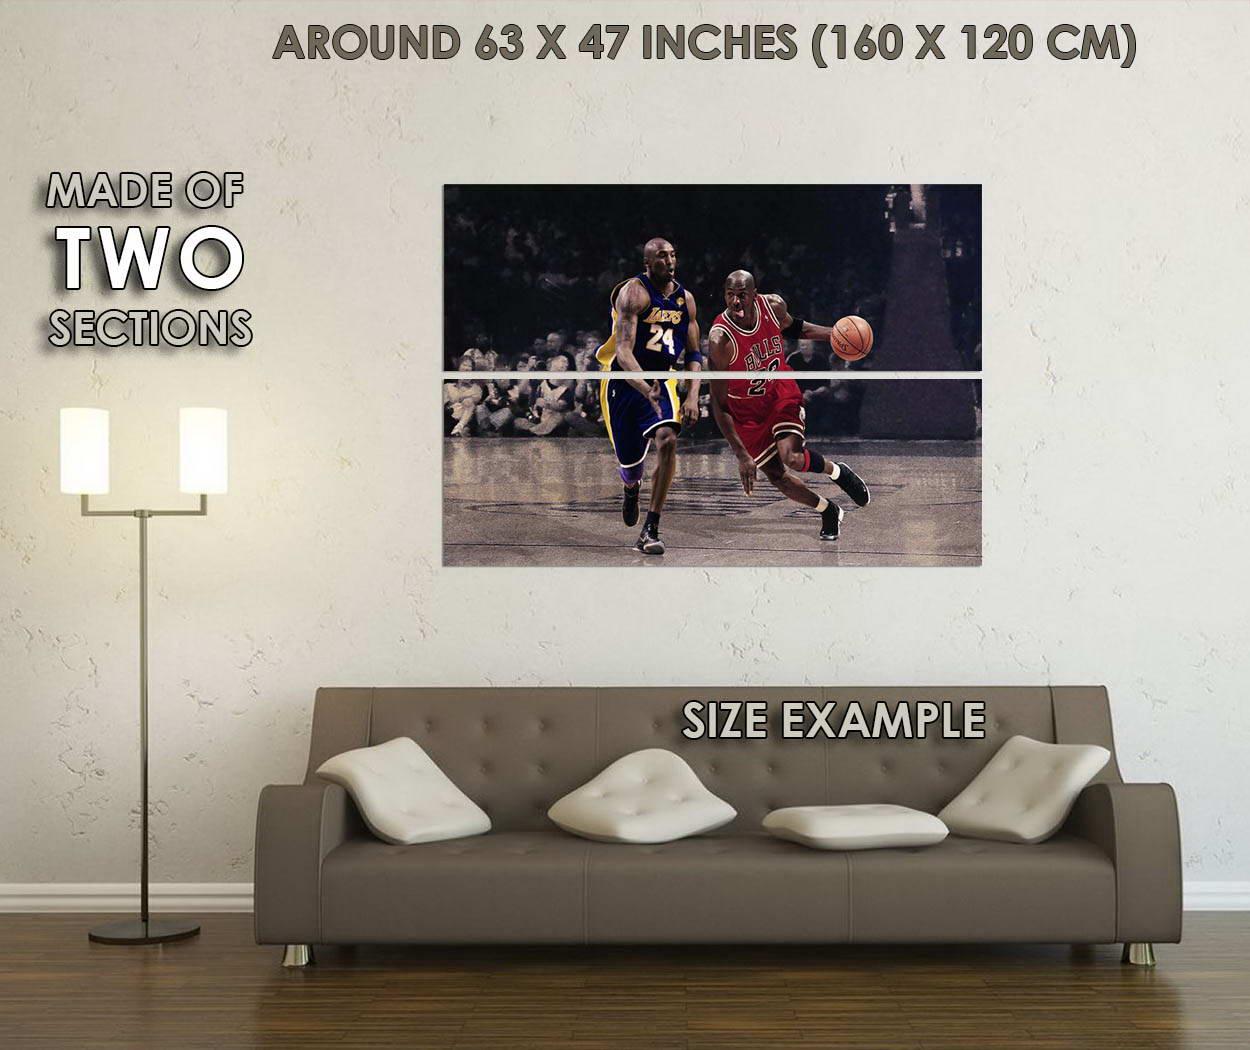 10818-Michael-Jordan-vs-Kobe-Basketball-MVP-Art-LAMINATED-POSTER-CA thumbnail 6